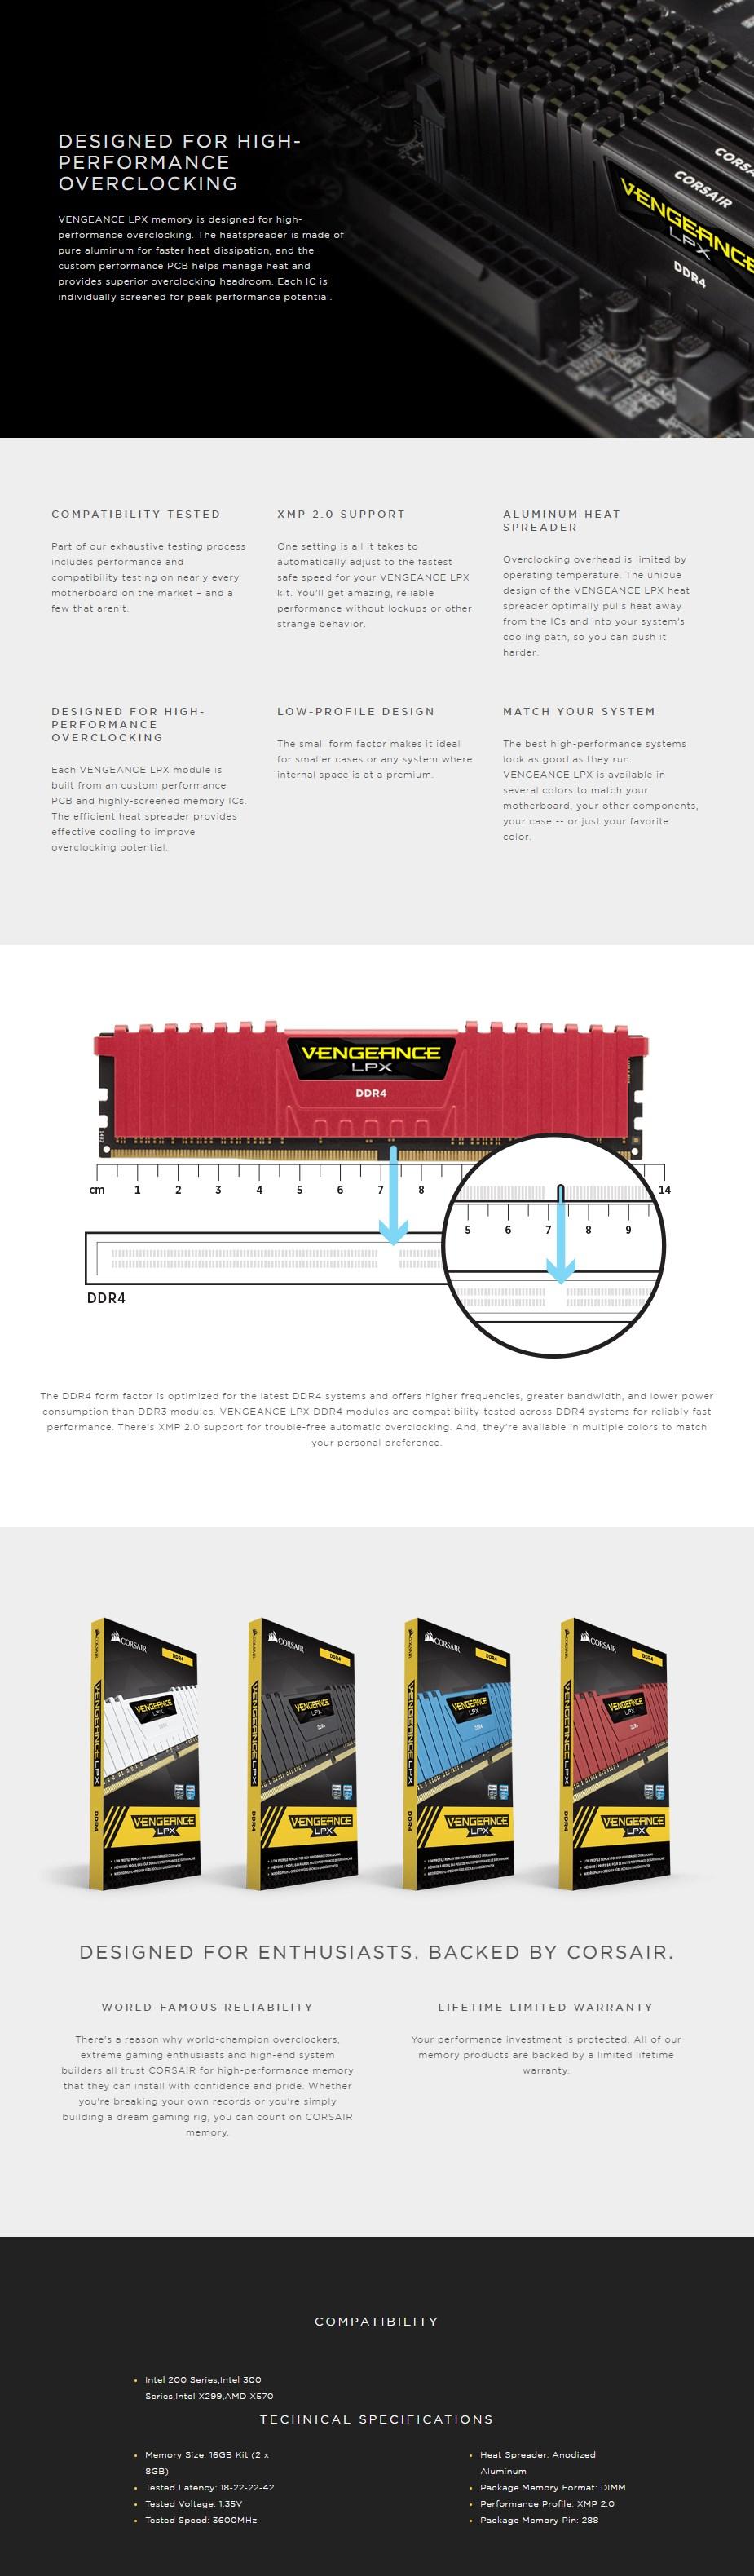 Corsair Vengeance LPX 16GB (2x 8GB) DDR4 3600MHz C18 AMD Ryzen Memory Black - Overview 1